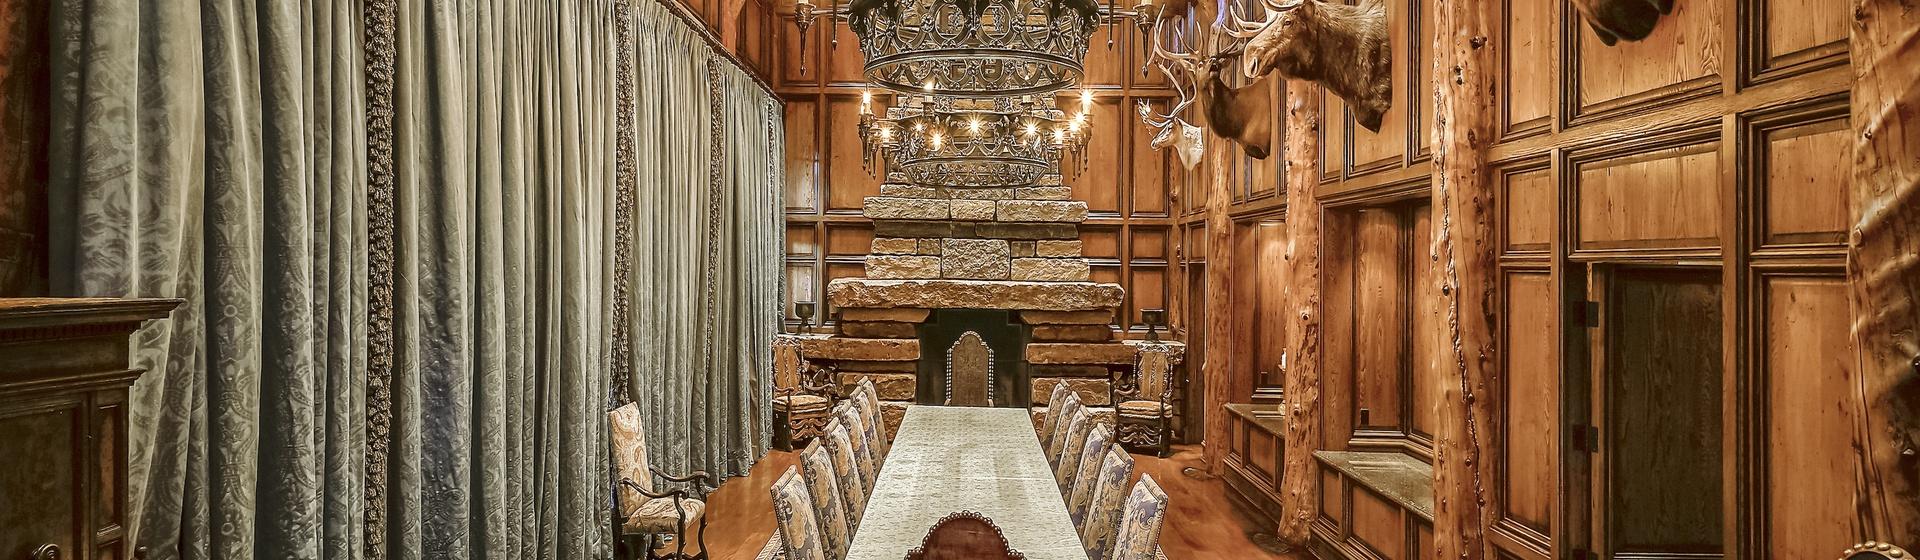 2.1-Telluride-Sleeping-Indian-Ranch-dining-room-web.JPG